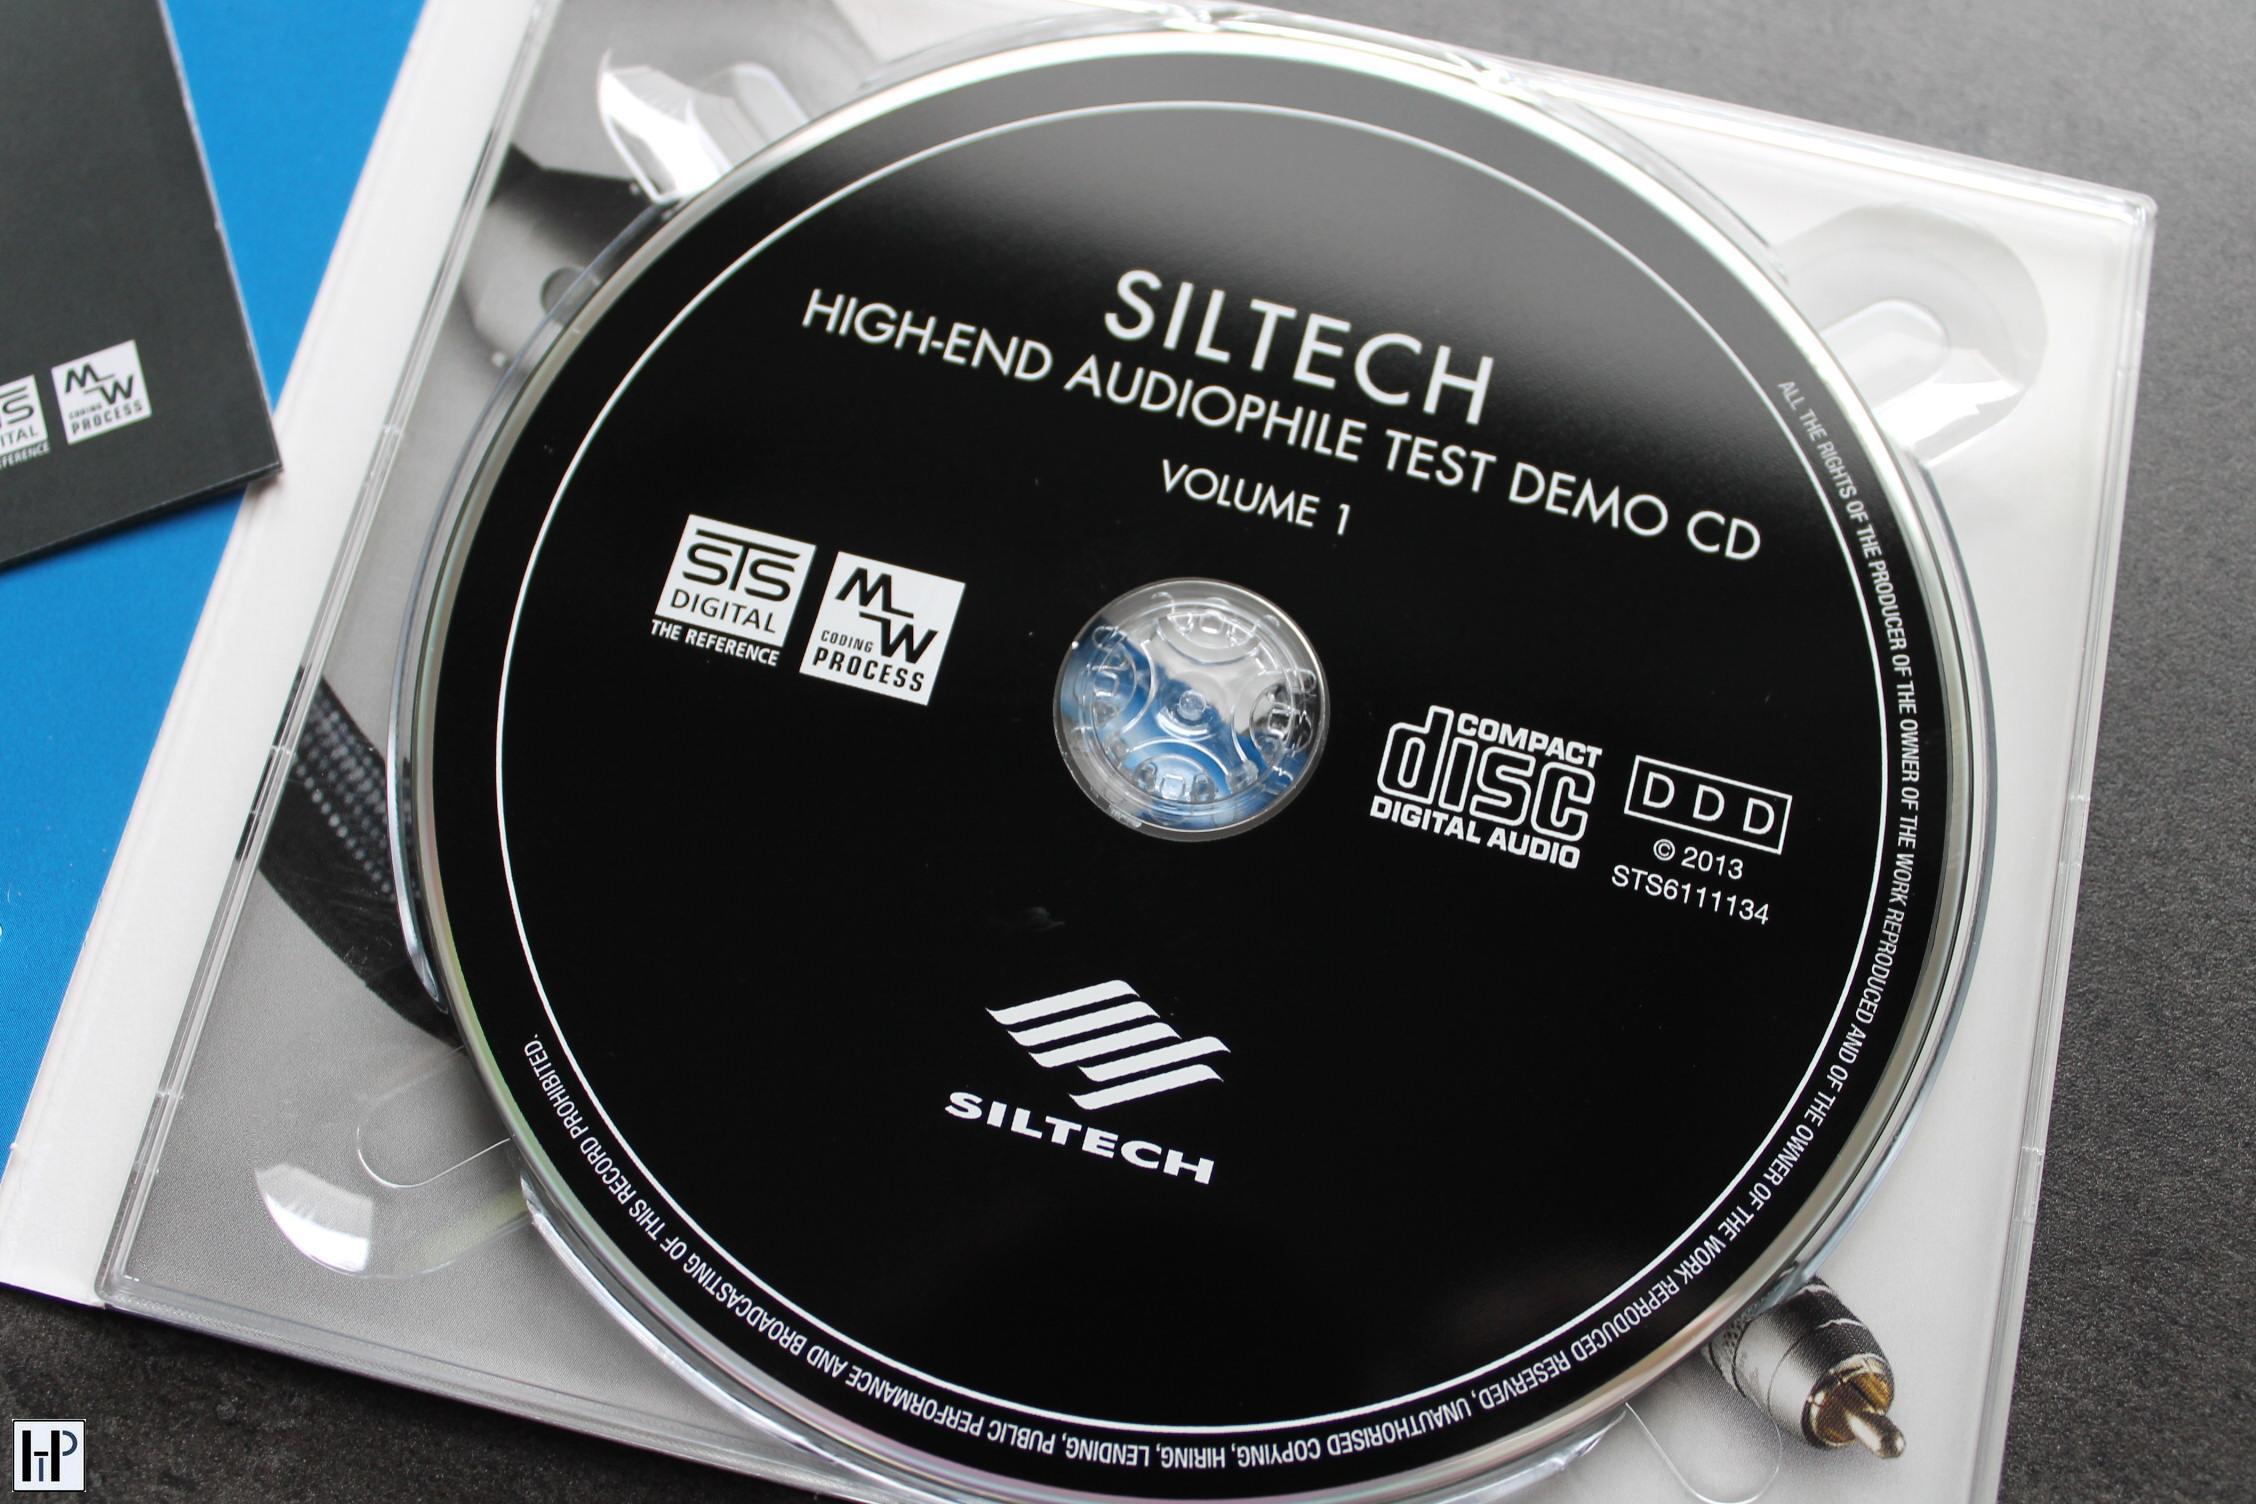 STS Digital - Siltech High End Audiophile Test CD Vol.1